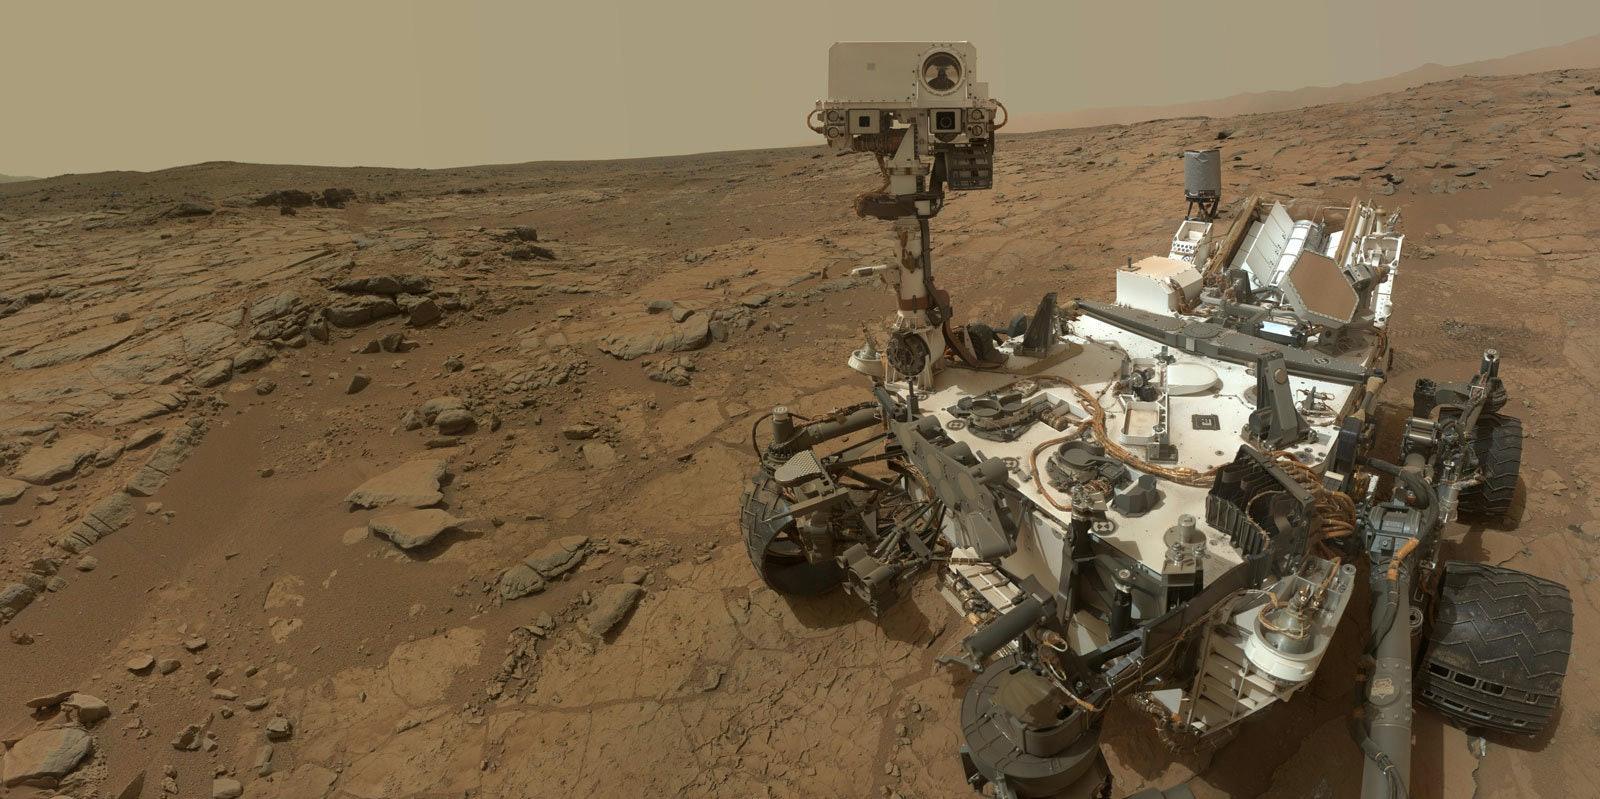 NASA Needs to Start Scraping Mars for DNA